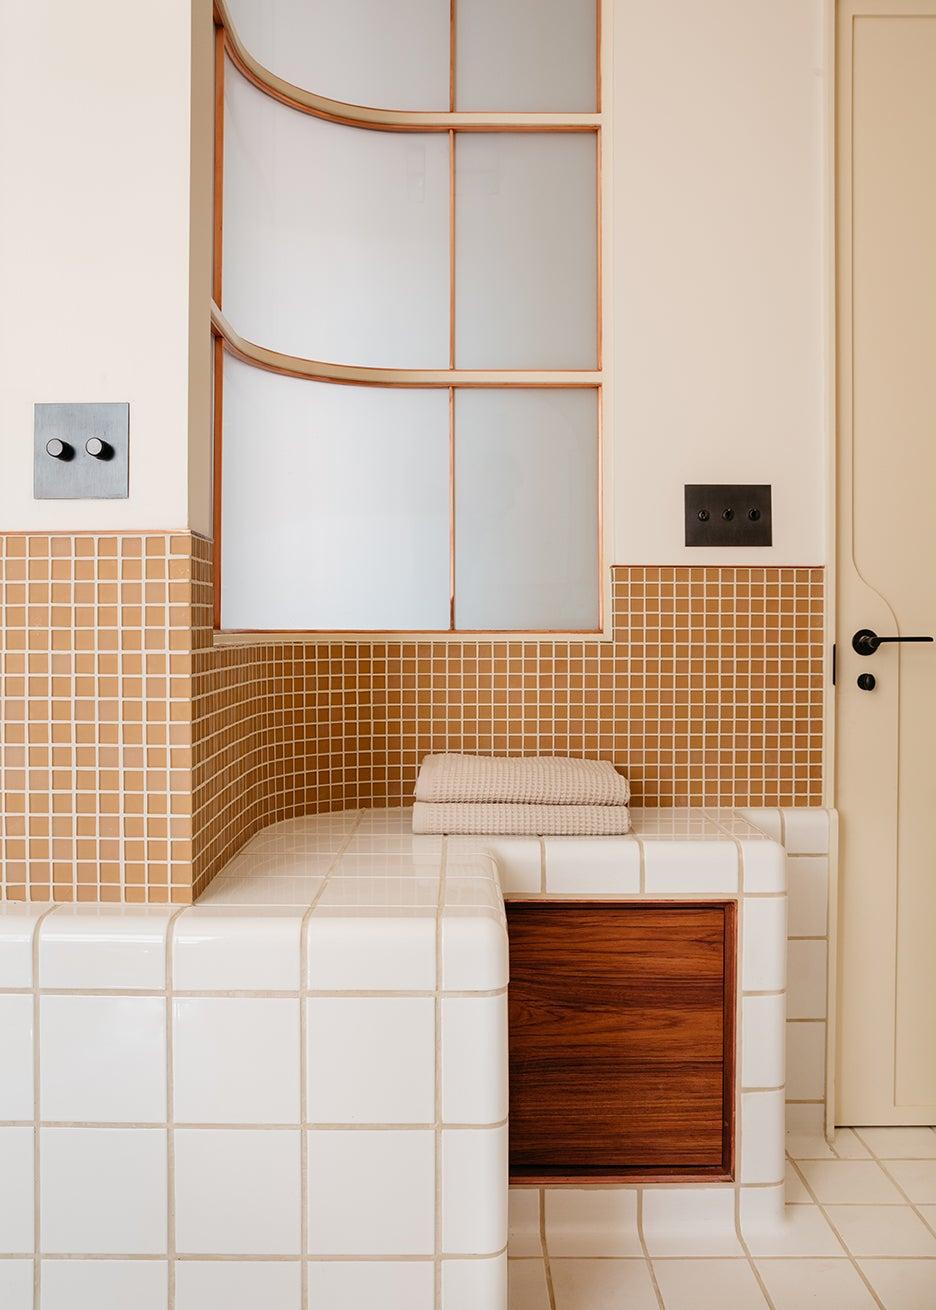 00-FEATURE-home-studio-tile-bathroom-domino